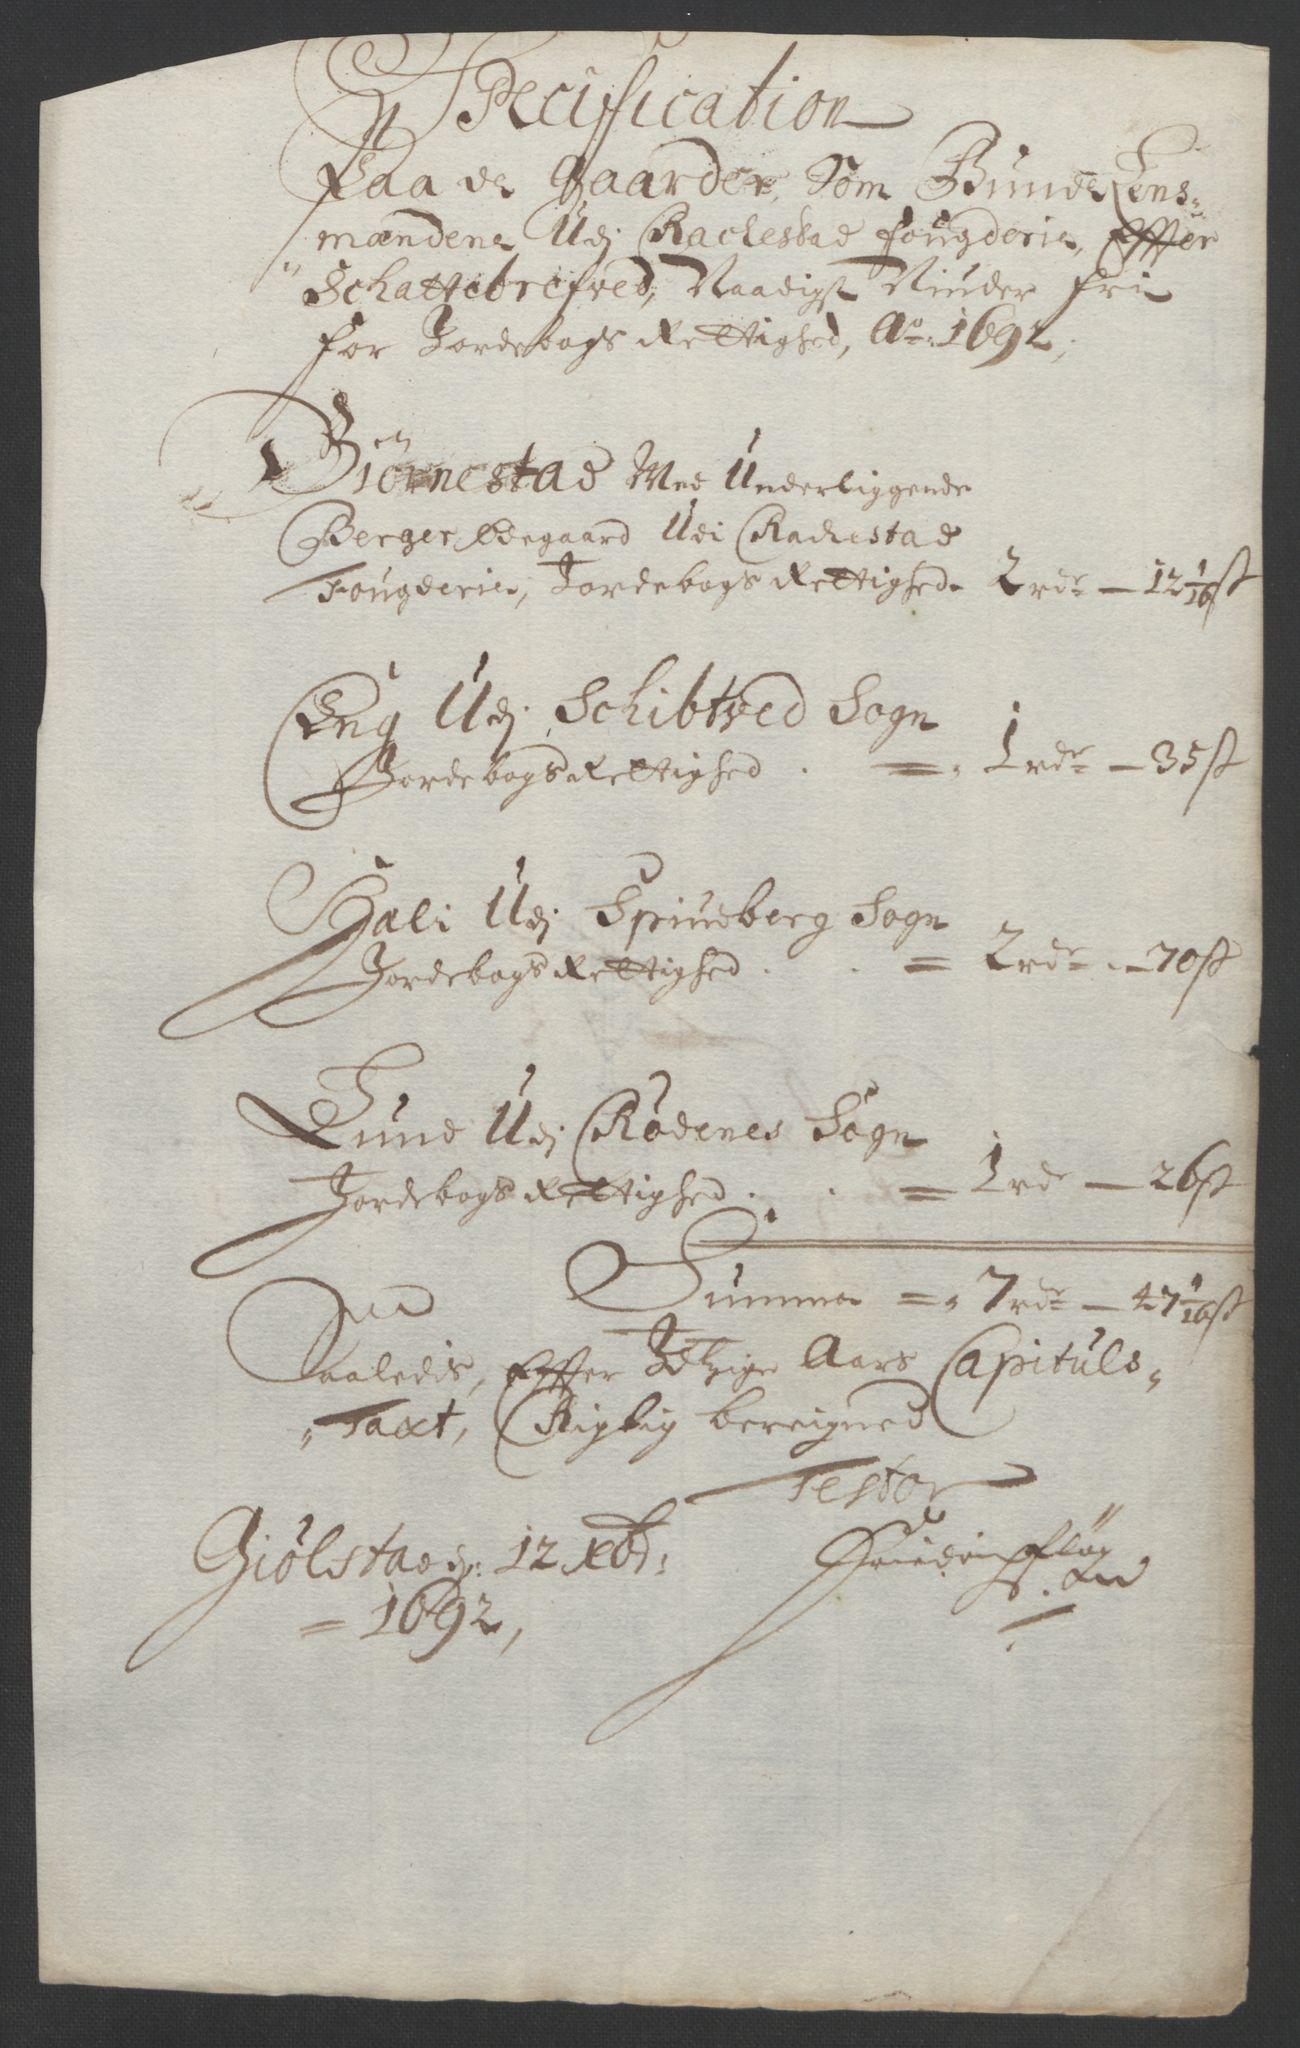 RA, Rentekammeret inntil 1814, Reviderte regnskaper, Fogderegnskap, R05/L0278: Fogderegnskap Rakkestad, 1691-1693, s. 338